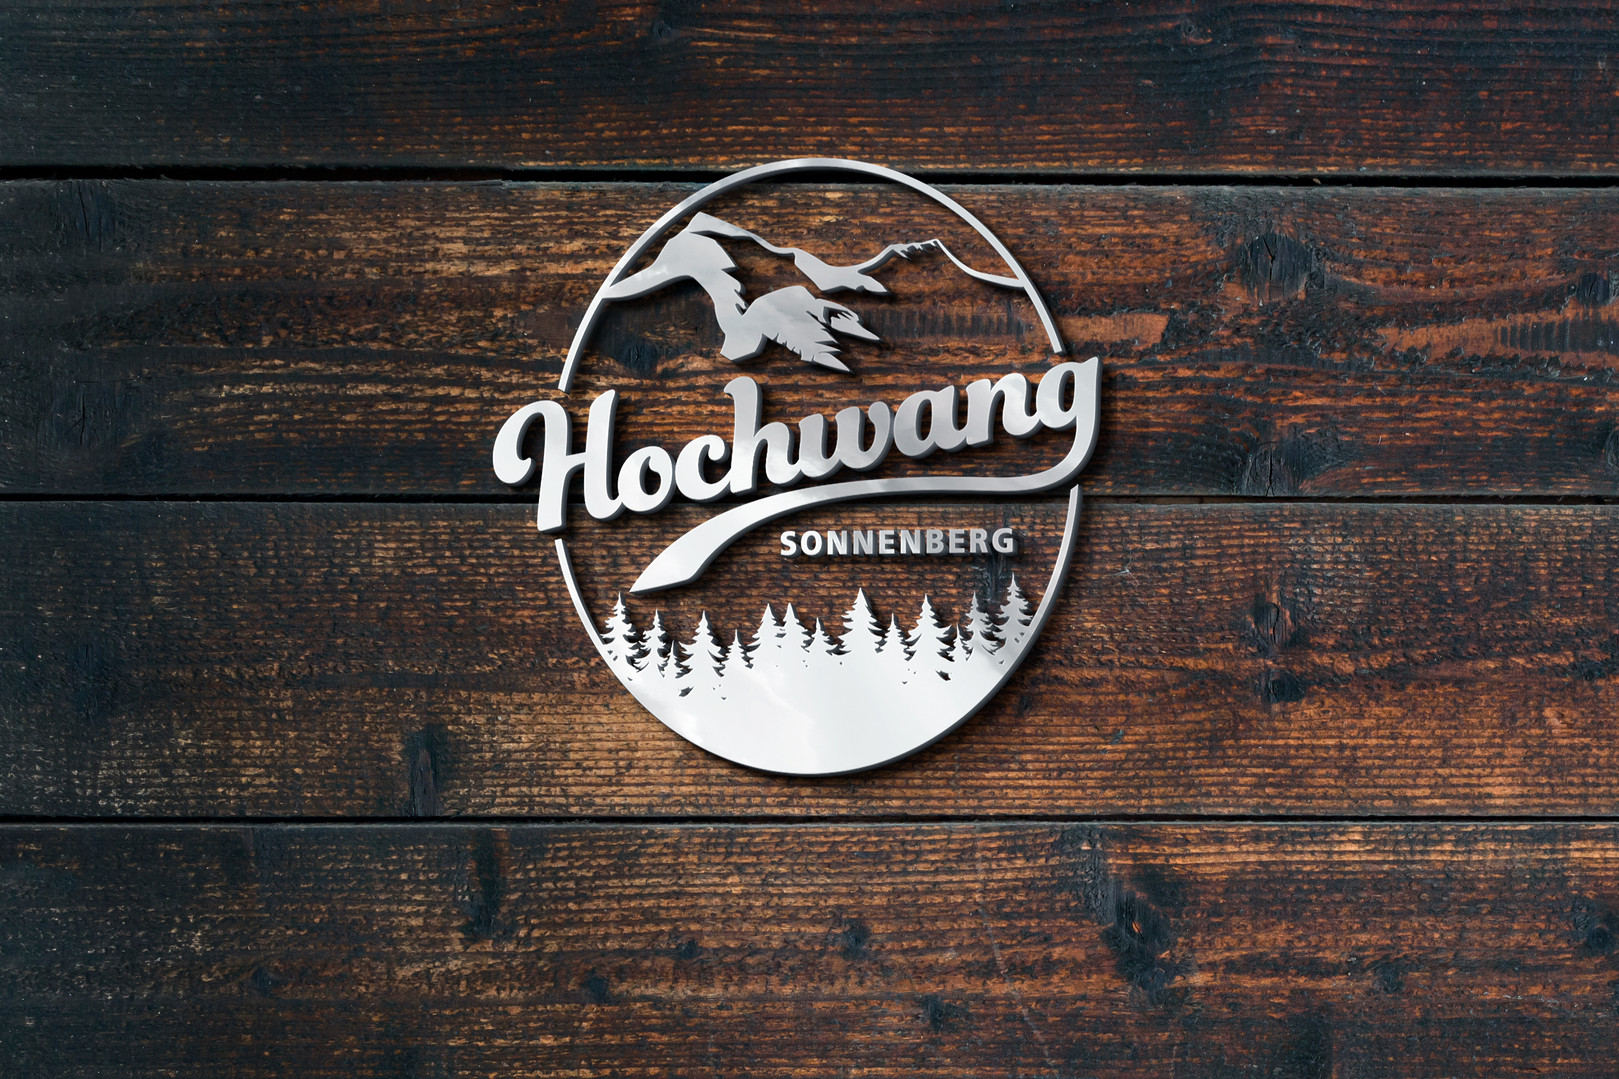 hochwang-logo.jpg